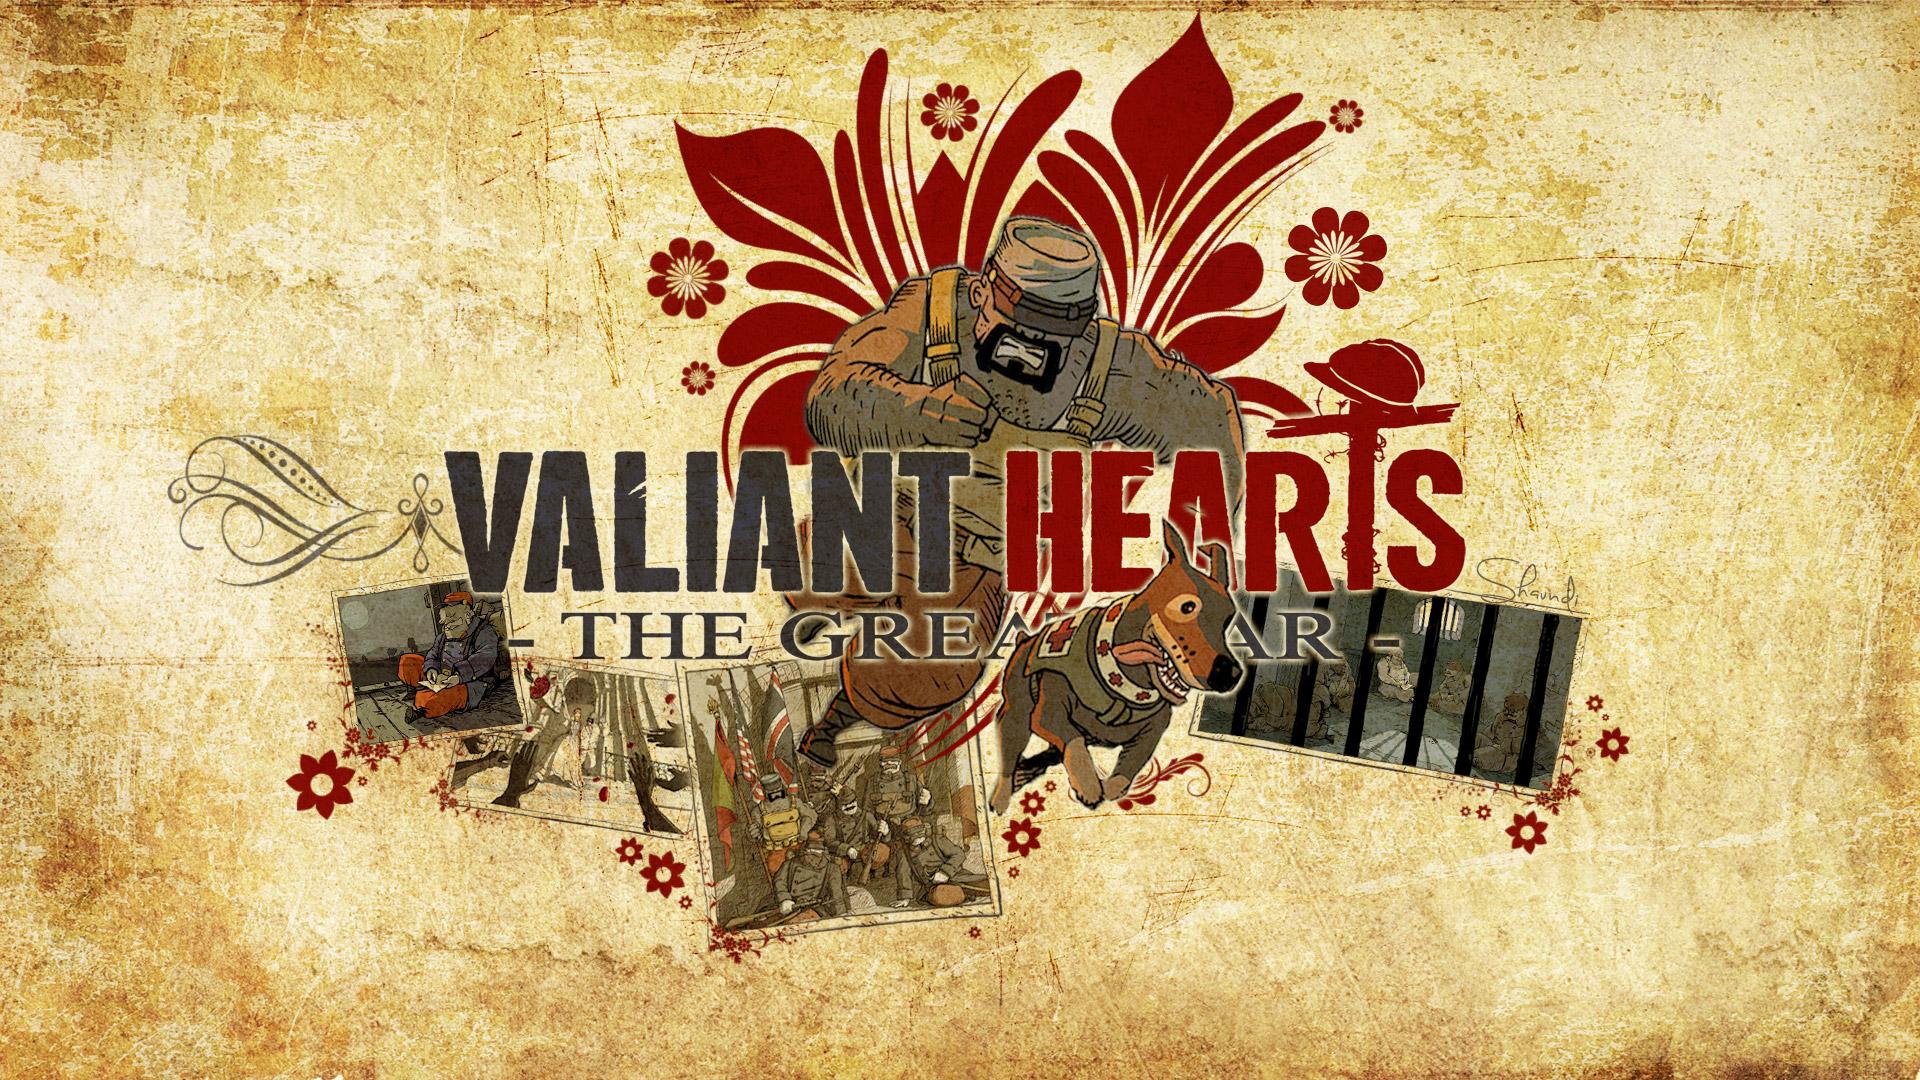 Valiant Hearts Wallpaper in 1920x1080